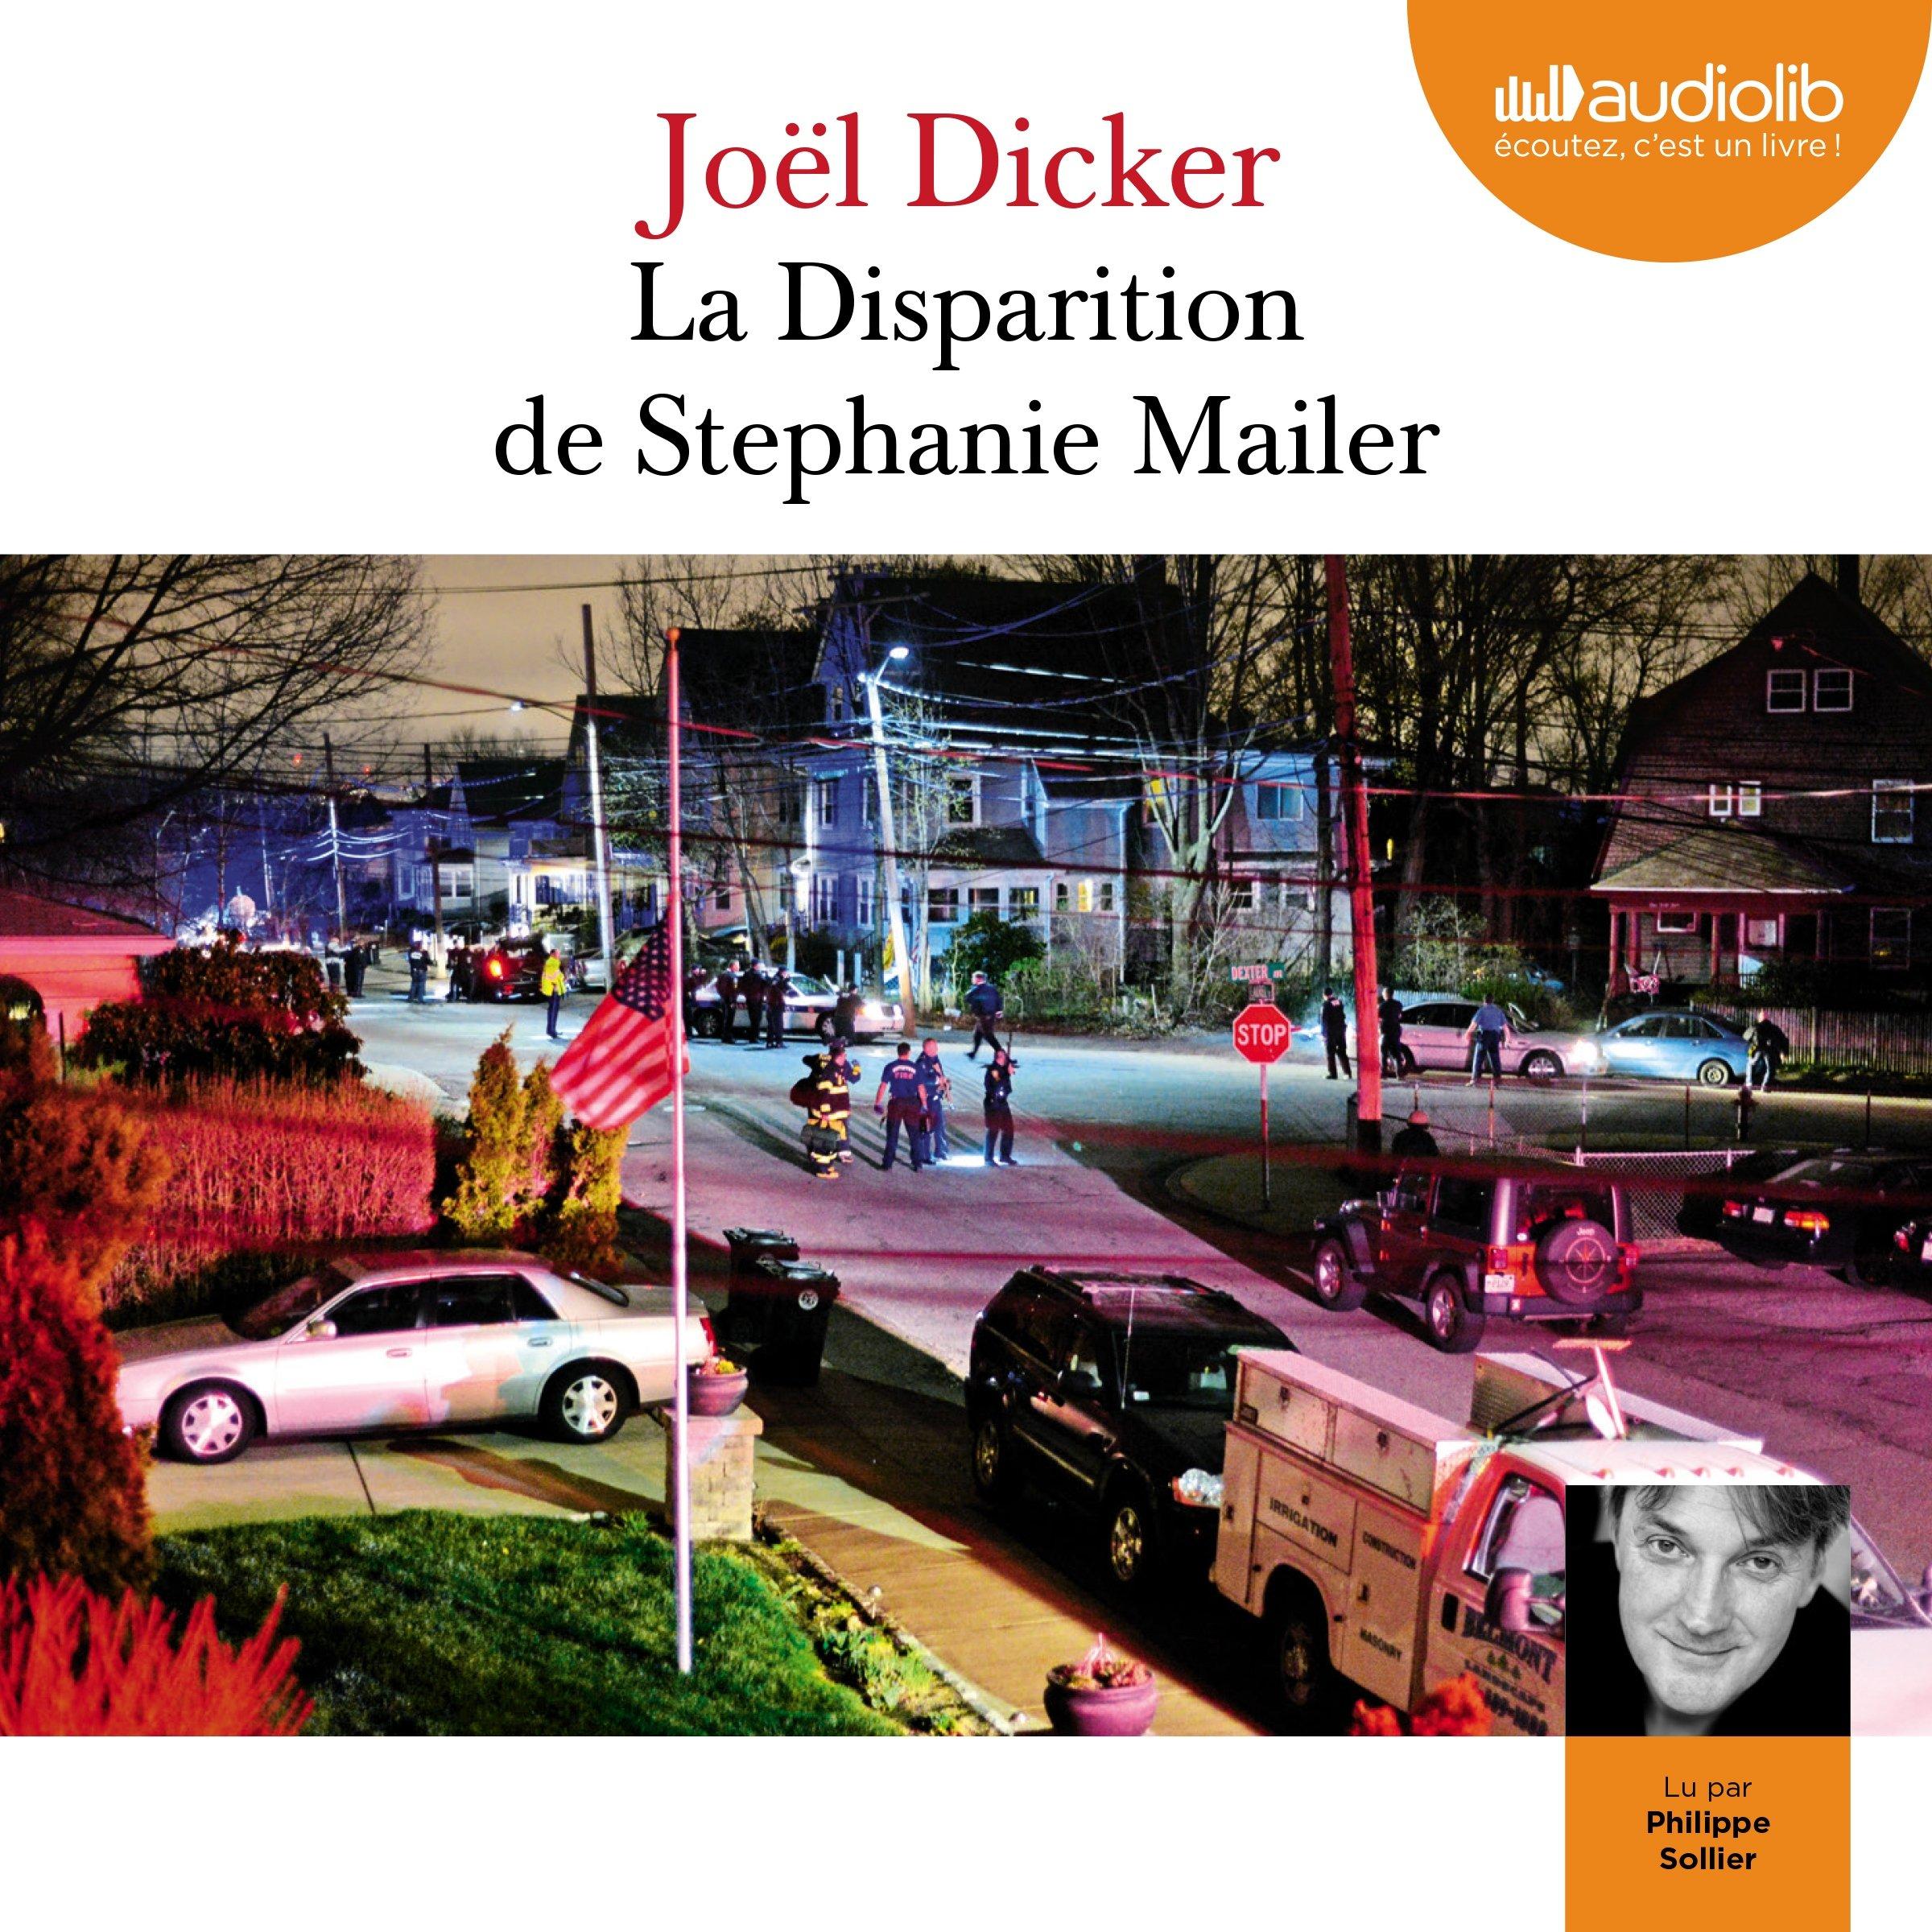 La disparition de Stephanie Mailer, de Joël Dicke